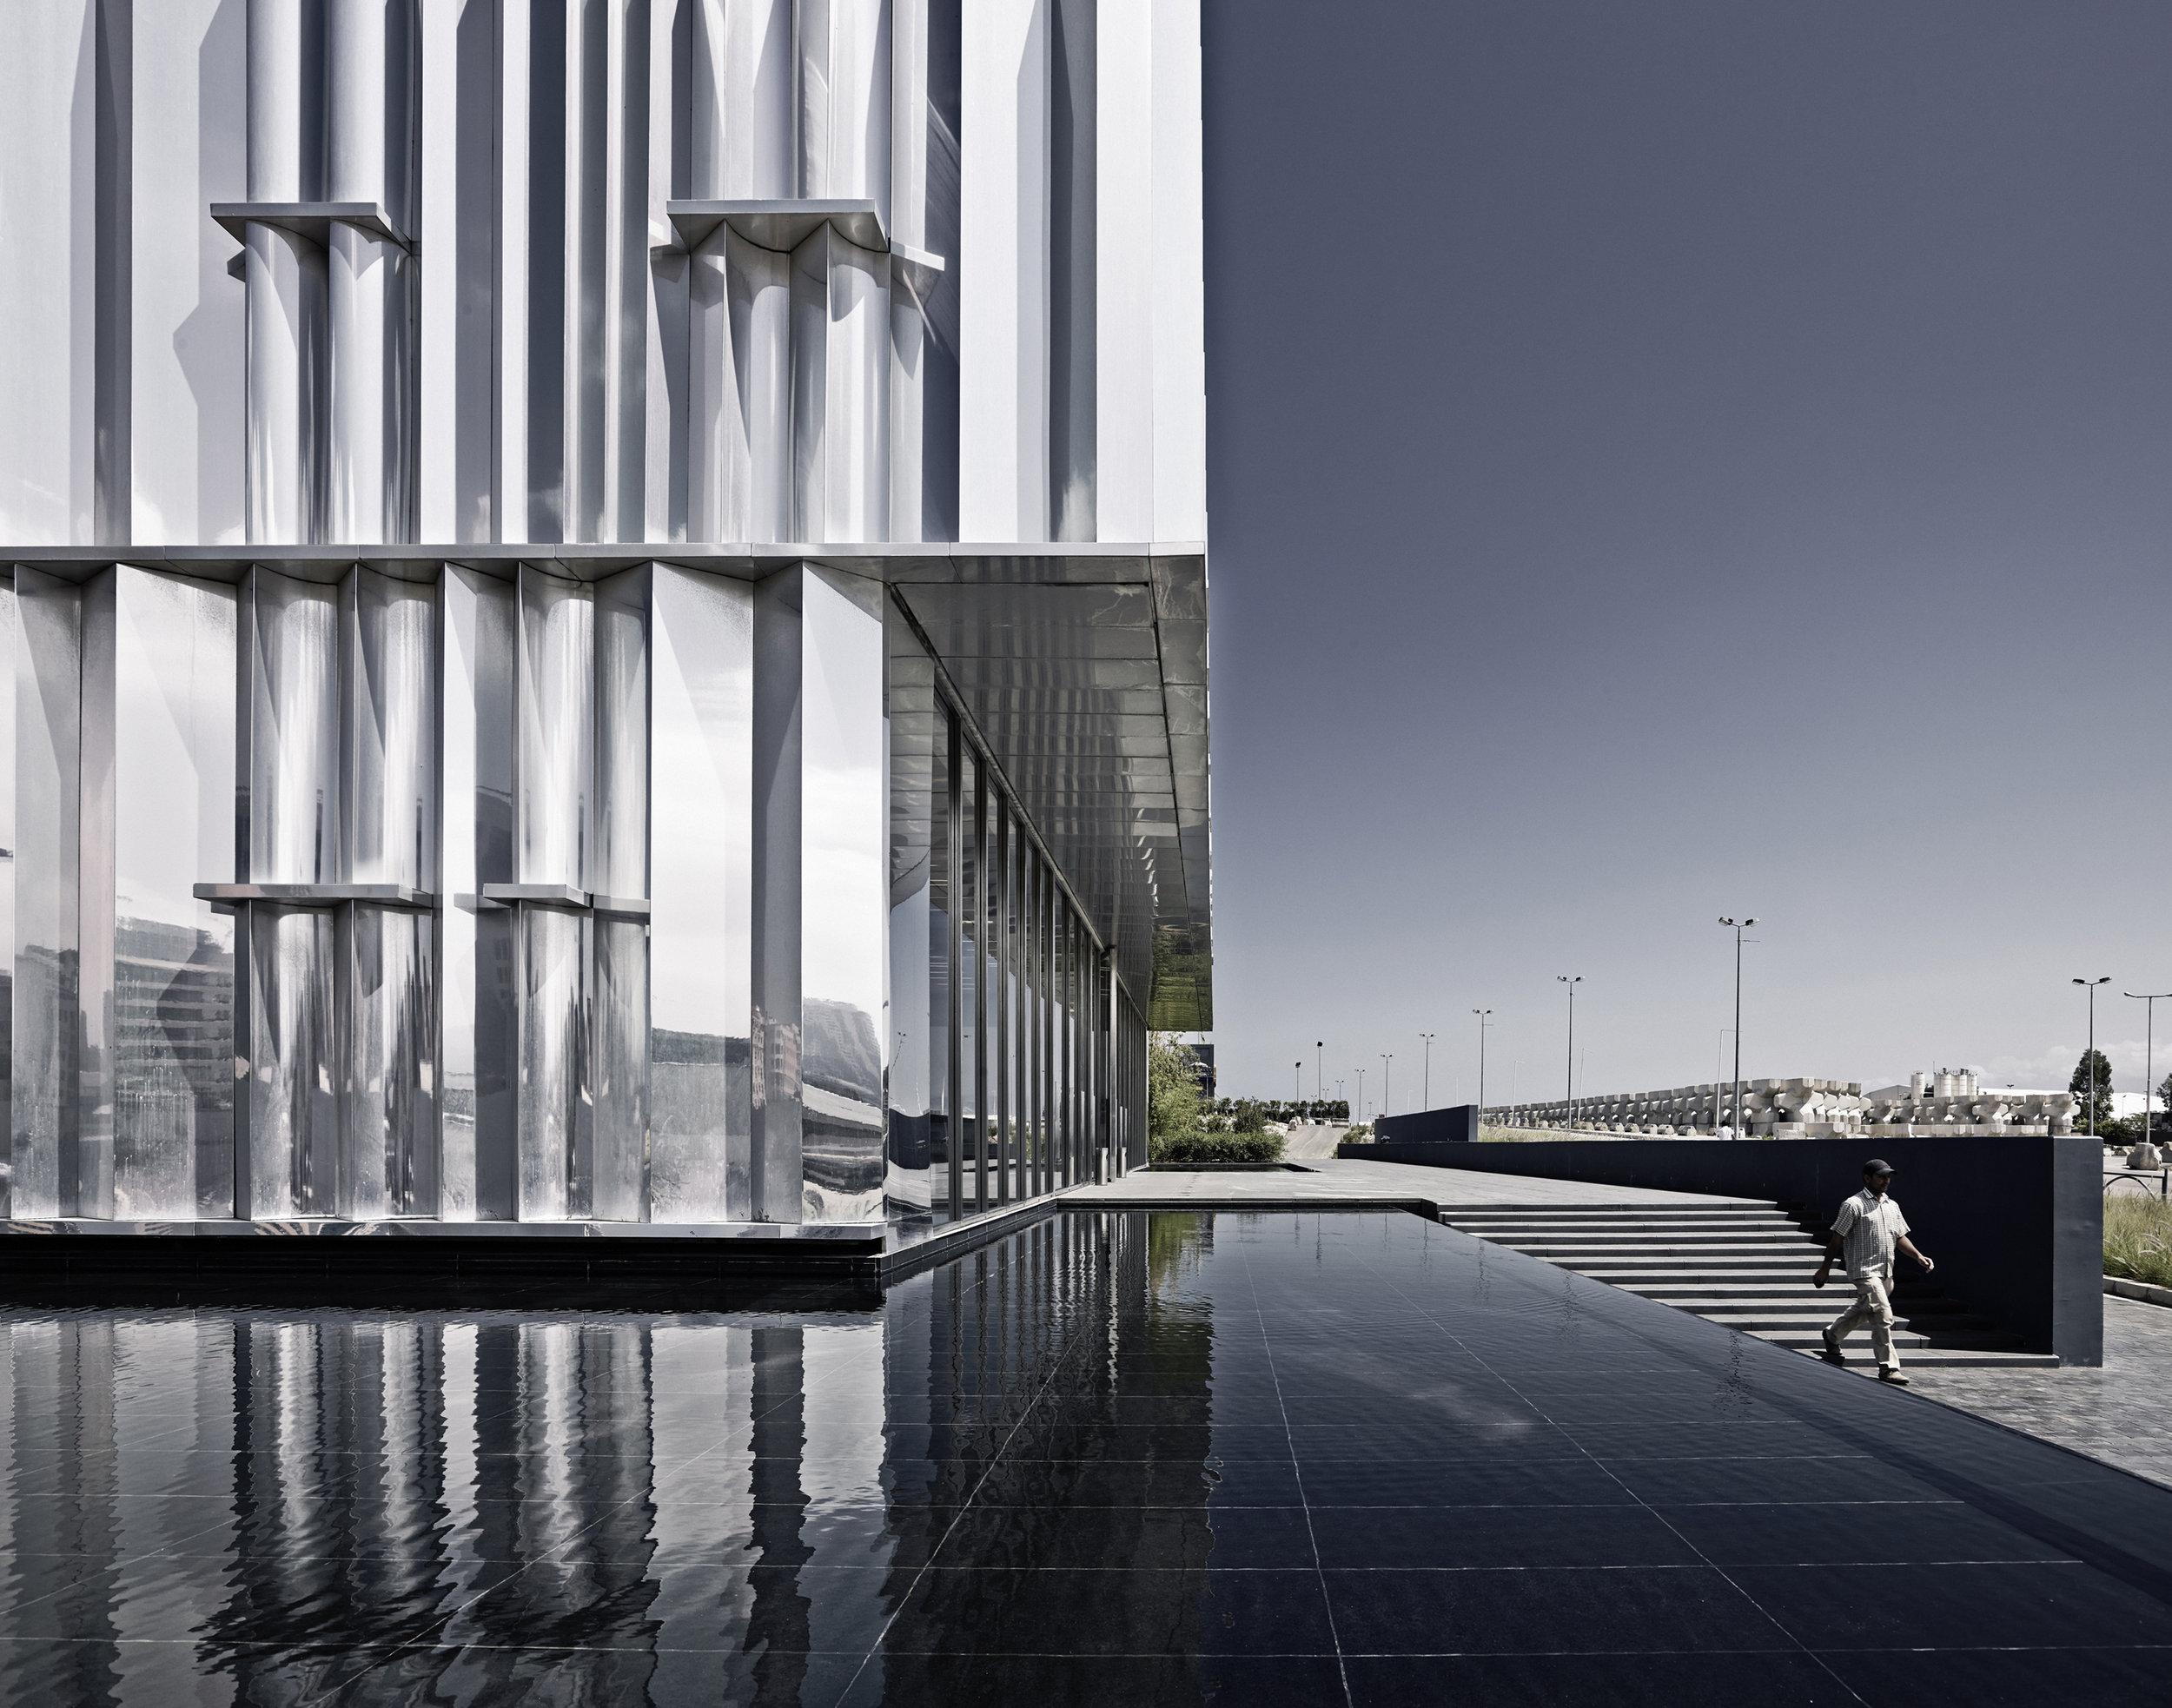 Beirut Exhibition Center. Design: L.E.FT Architects. Photo: Joe Kesrouani